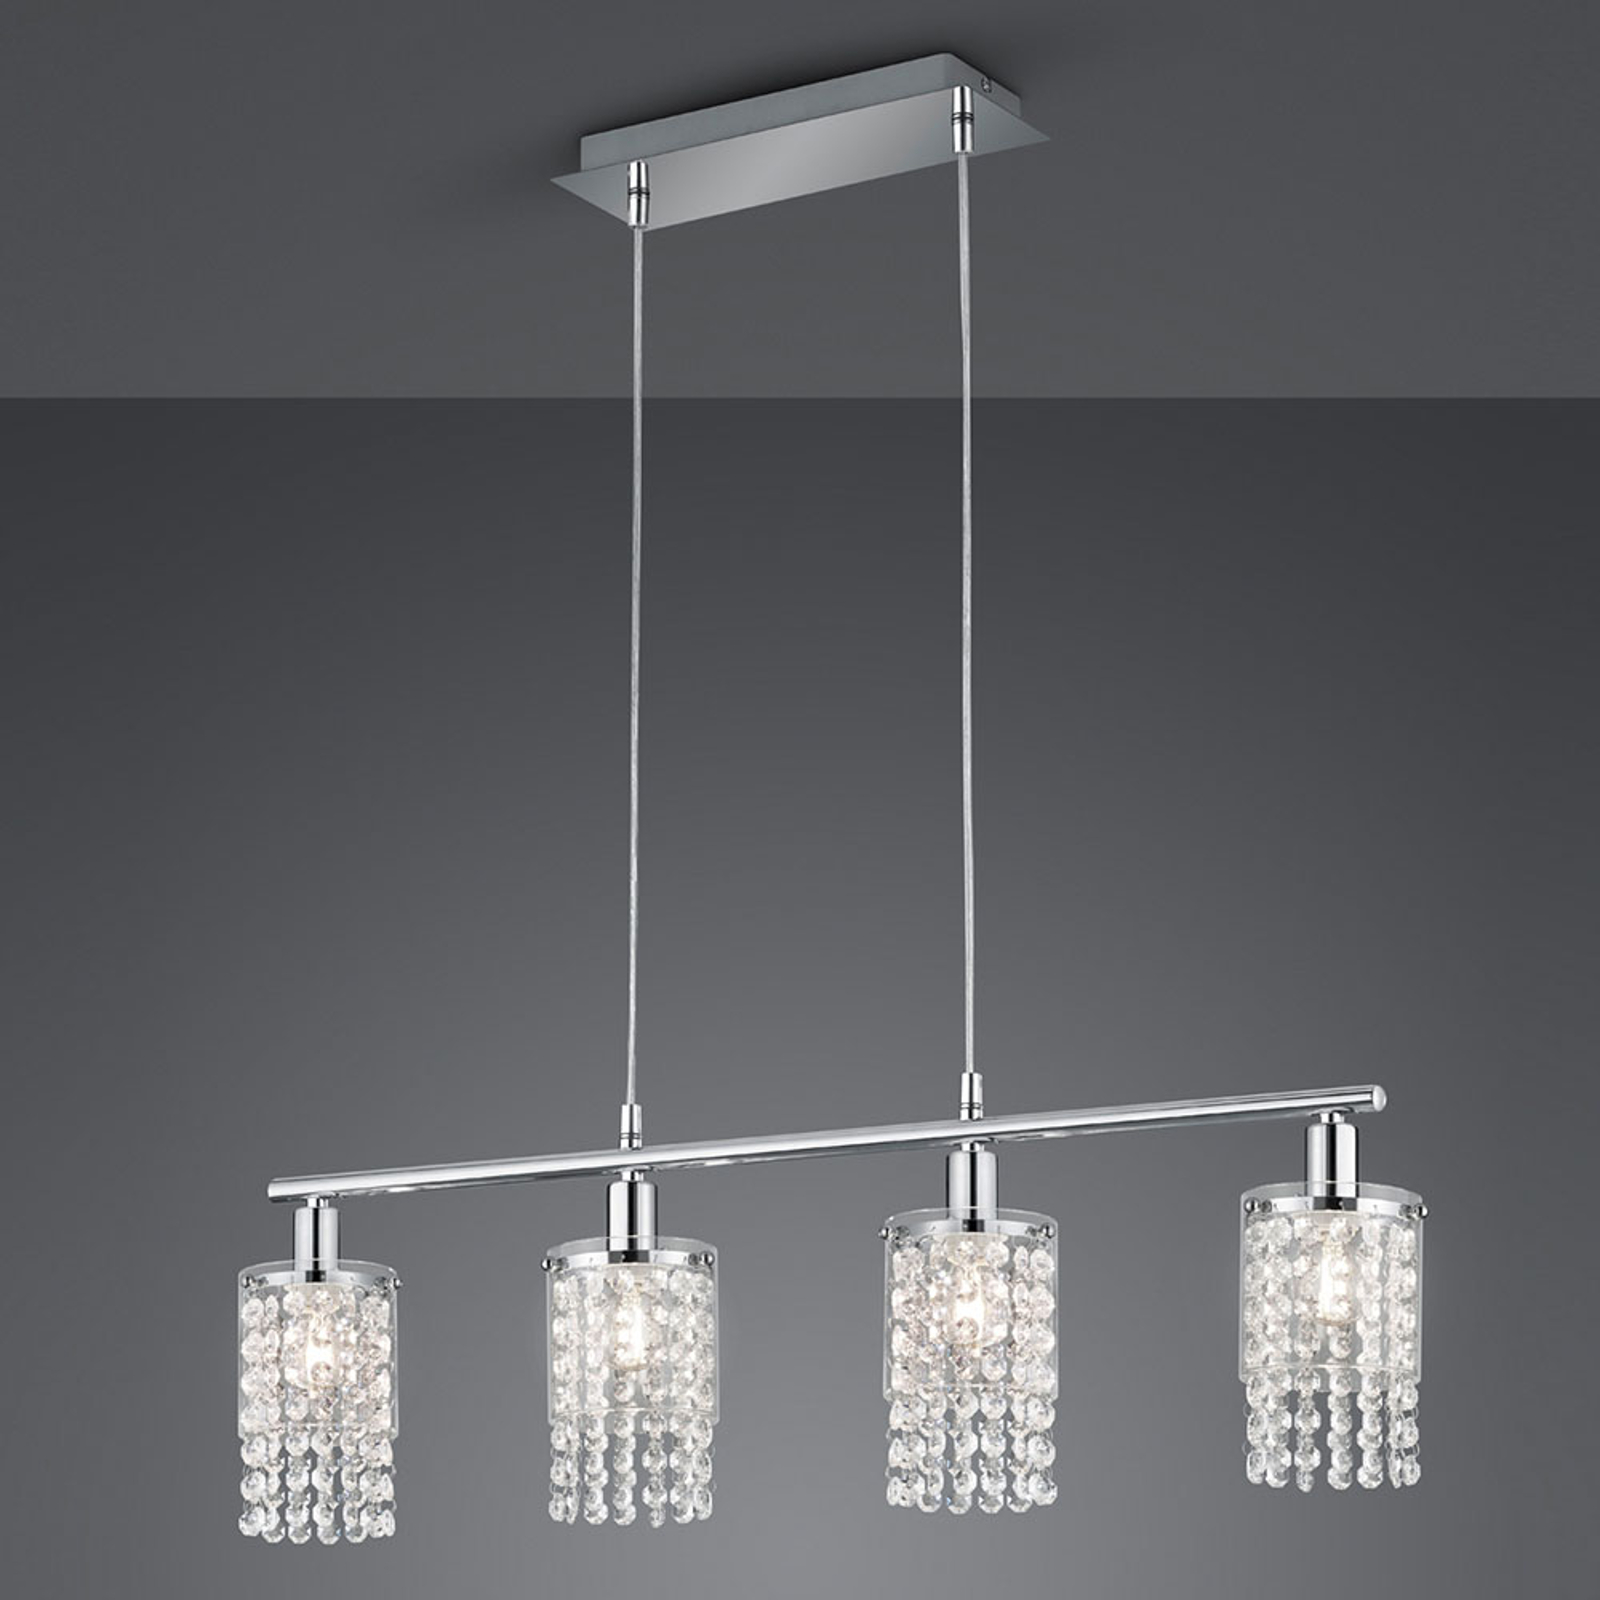 Hanglamp Posh met behang, 4-lamps